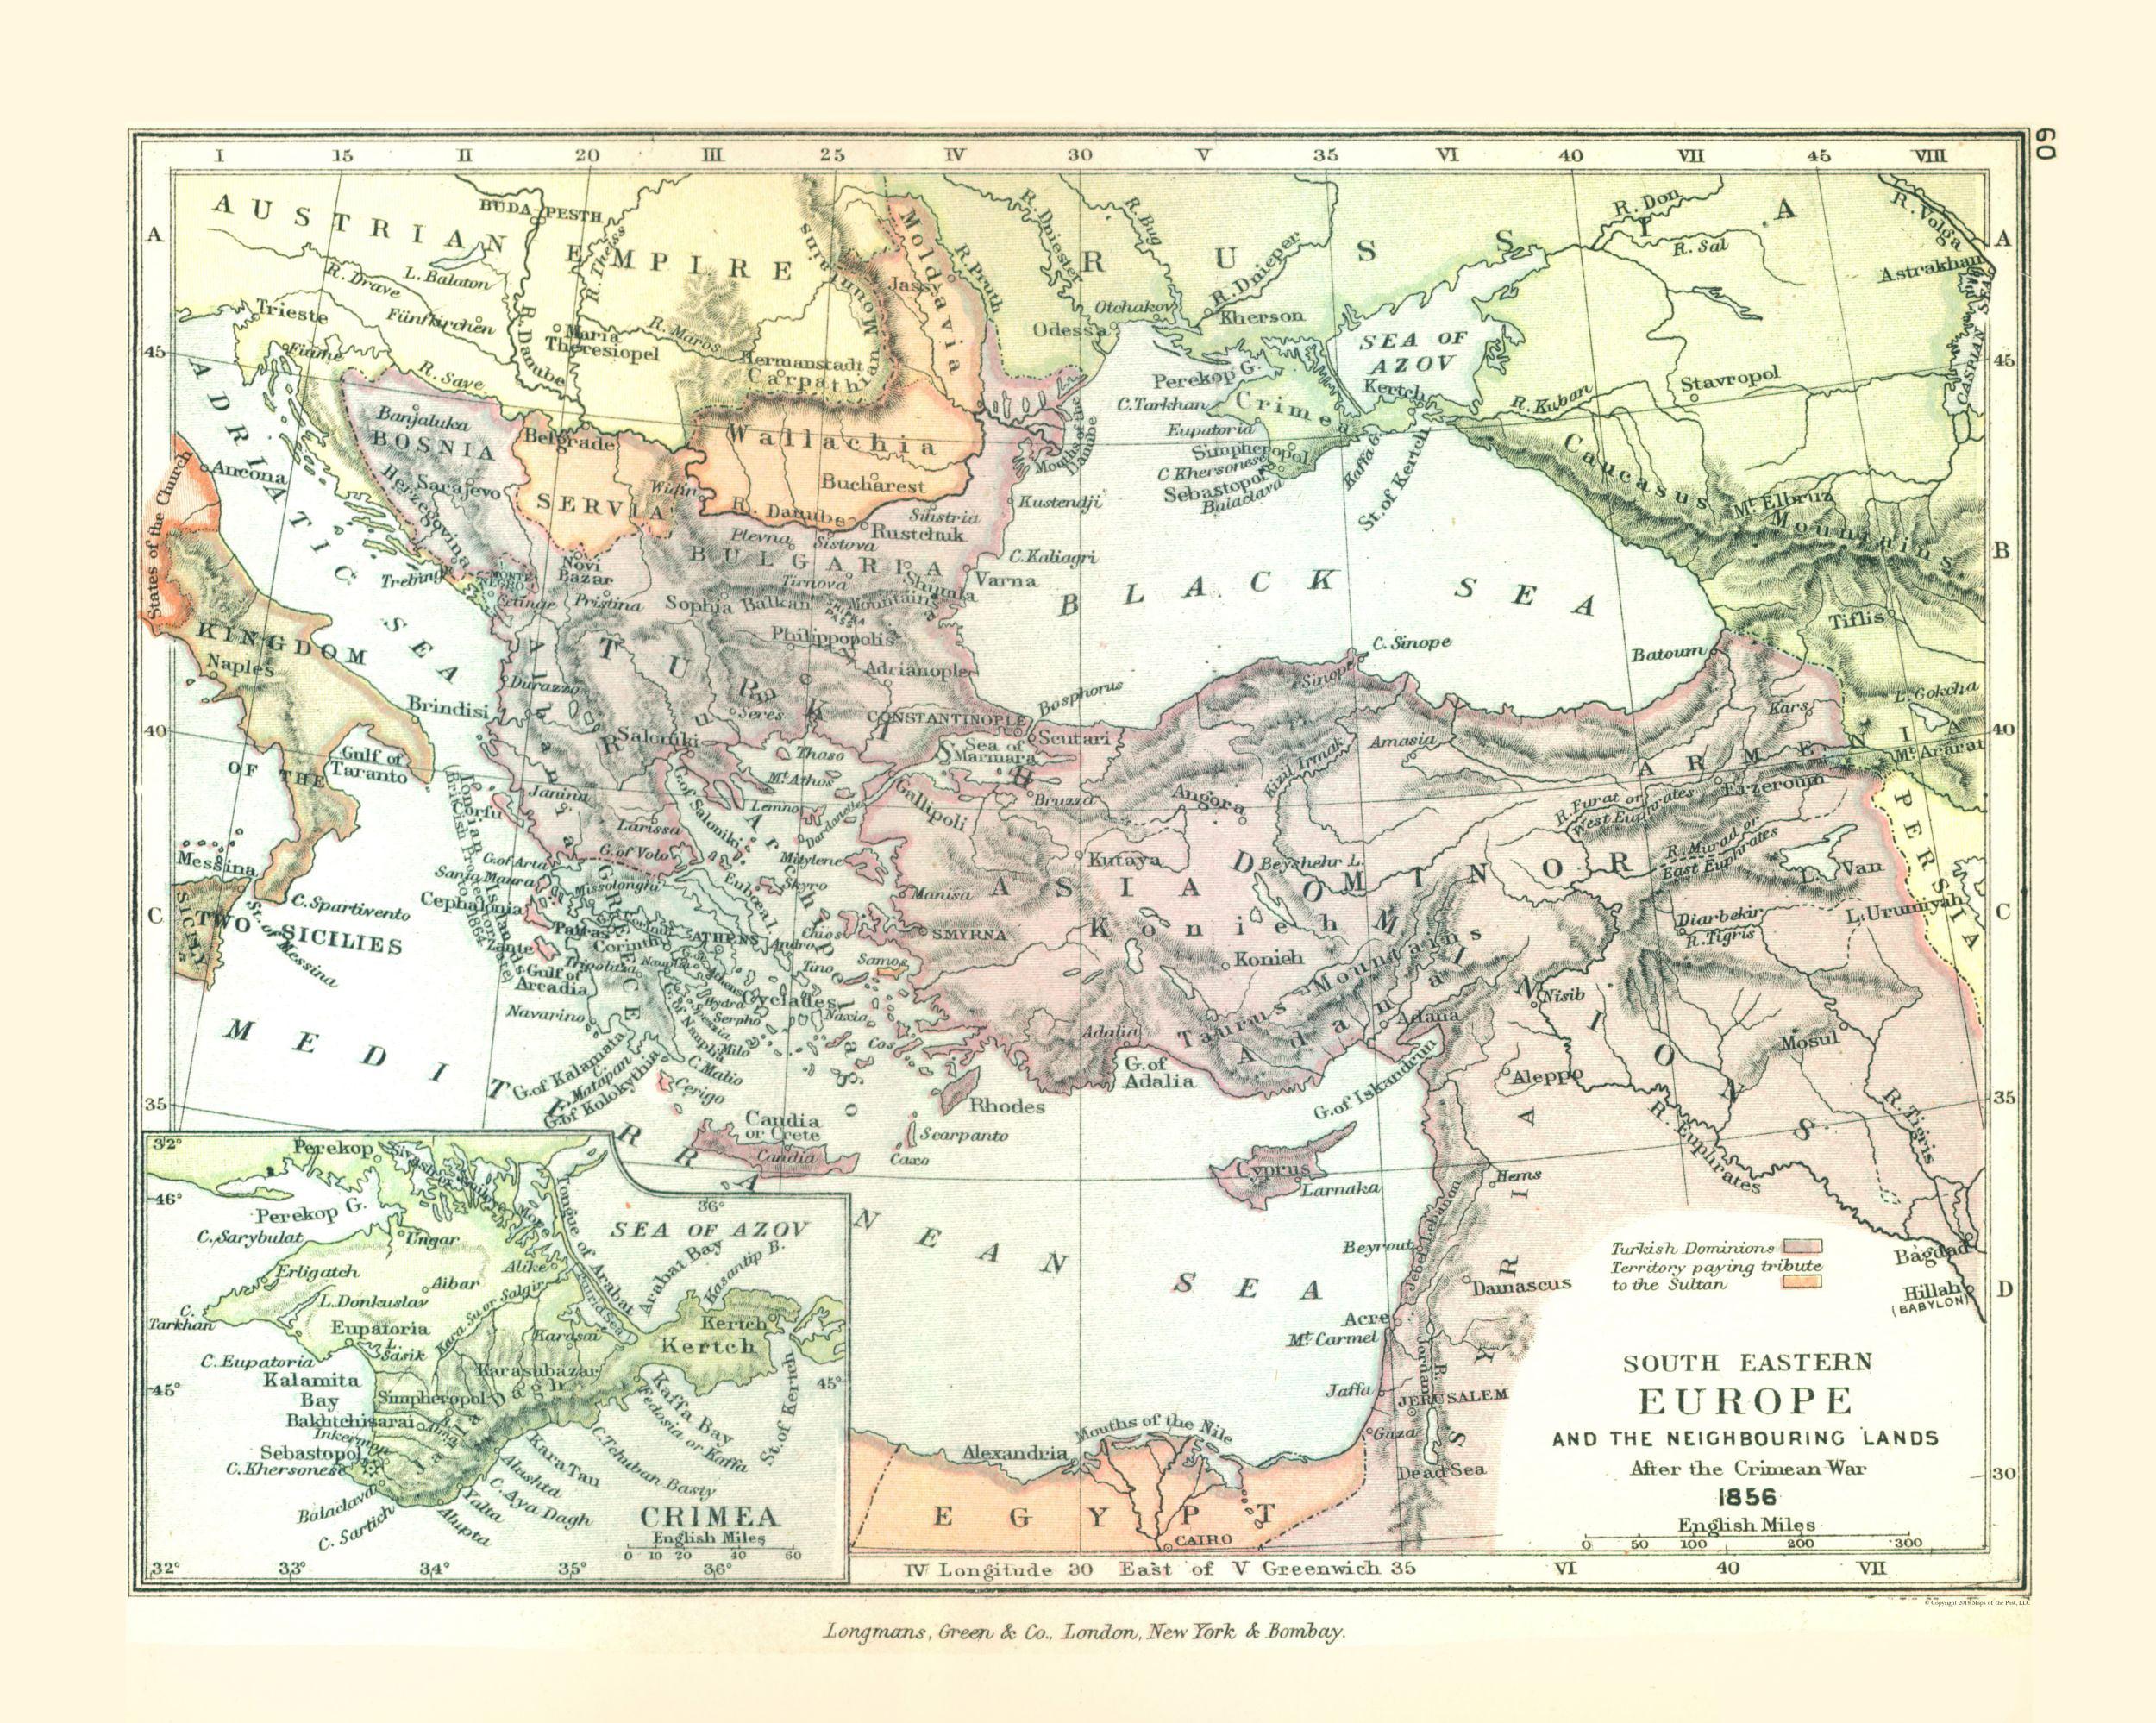 Picture of: Old Europe Map Southeastern Europe In 1856 Gardiner 1902 23 X 38 74 Walmart Com Walmart Com